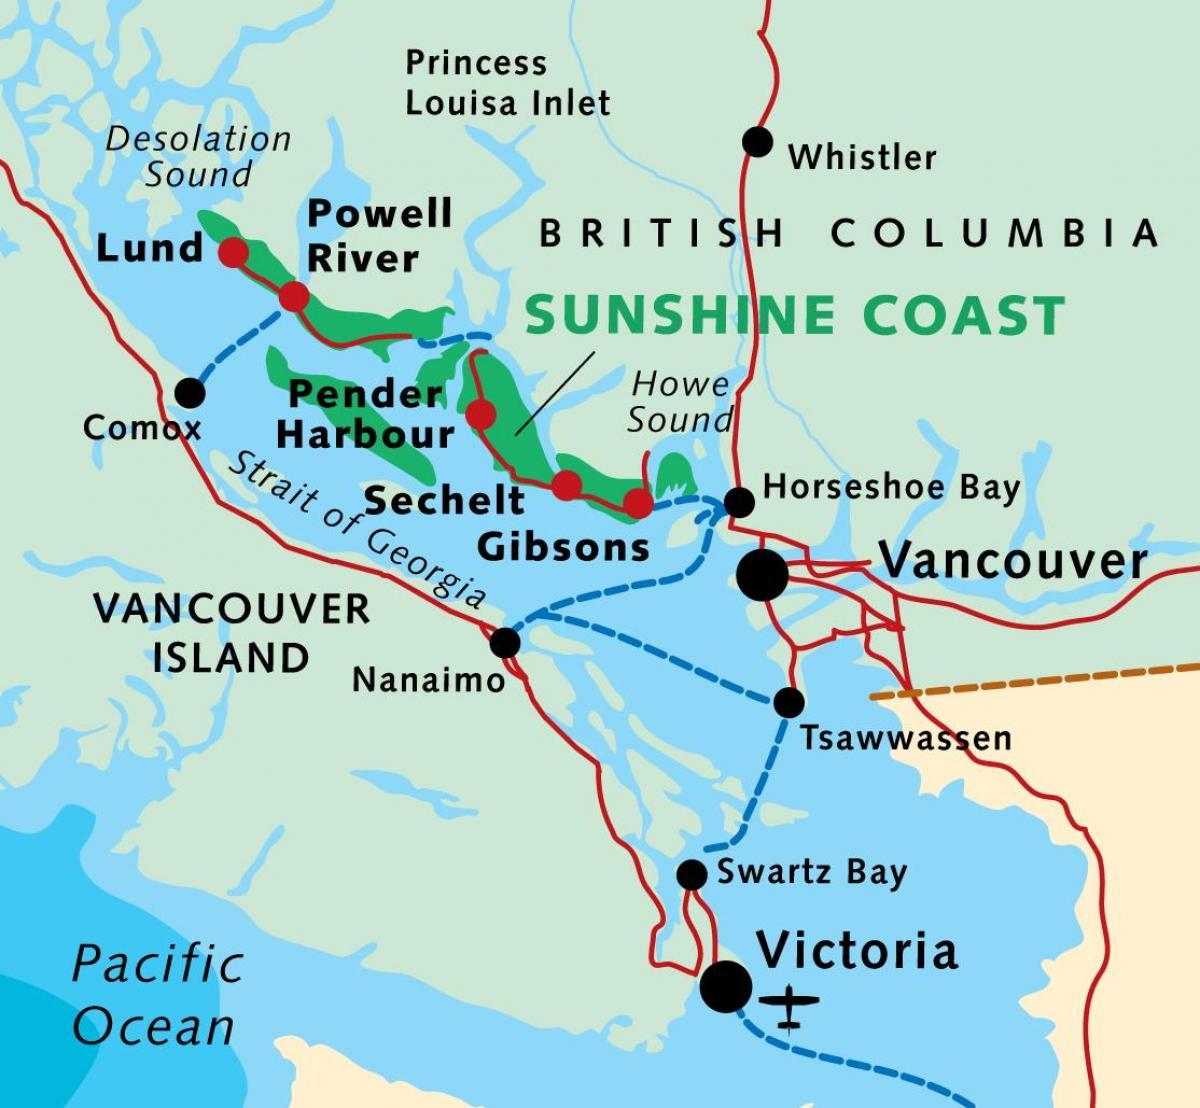 Map Of Sunshine Coast Bc Sunshine coast Canada map   Map of sunshine coast bc Canada  Map Of Sunshine Coast Bc